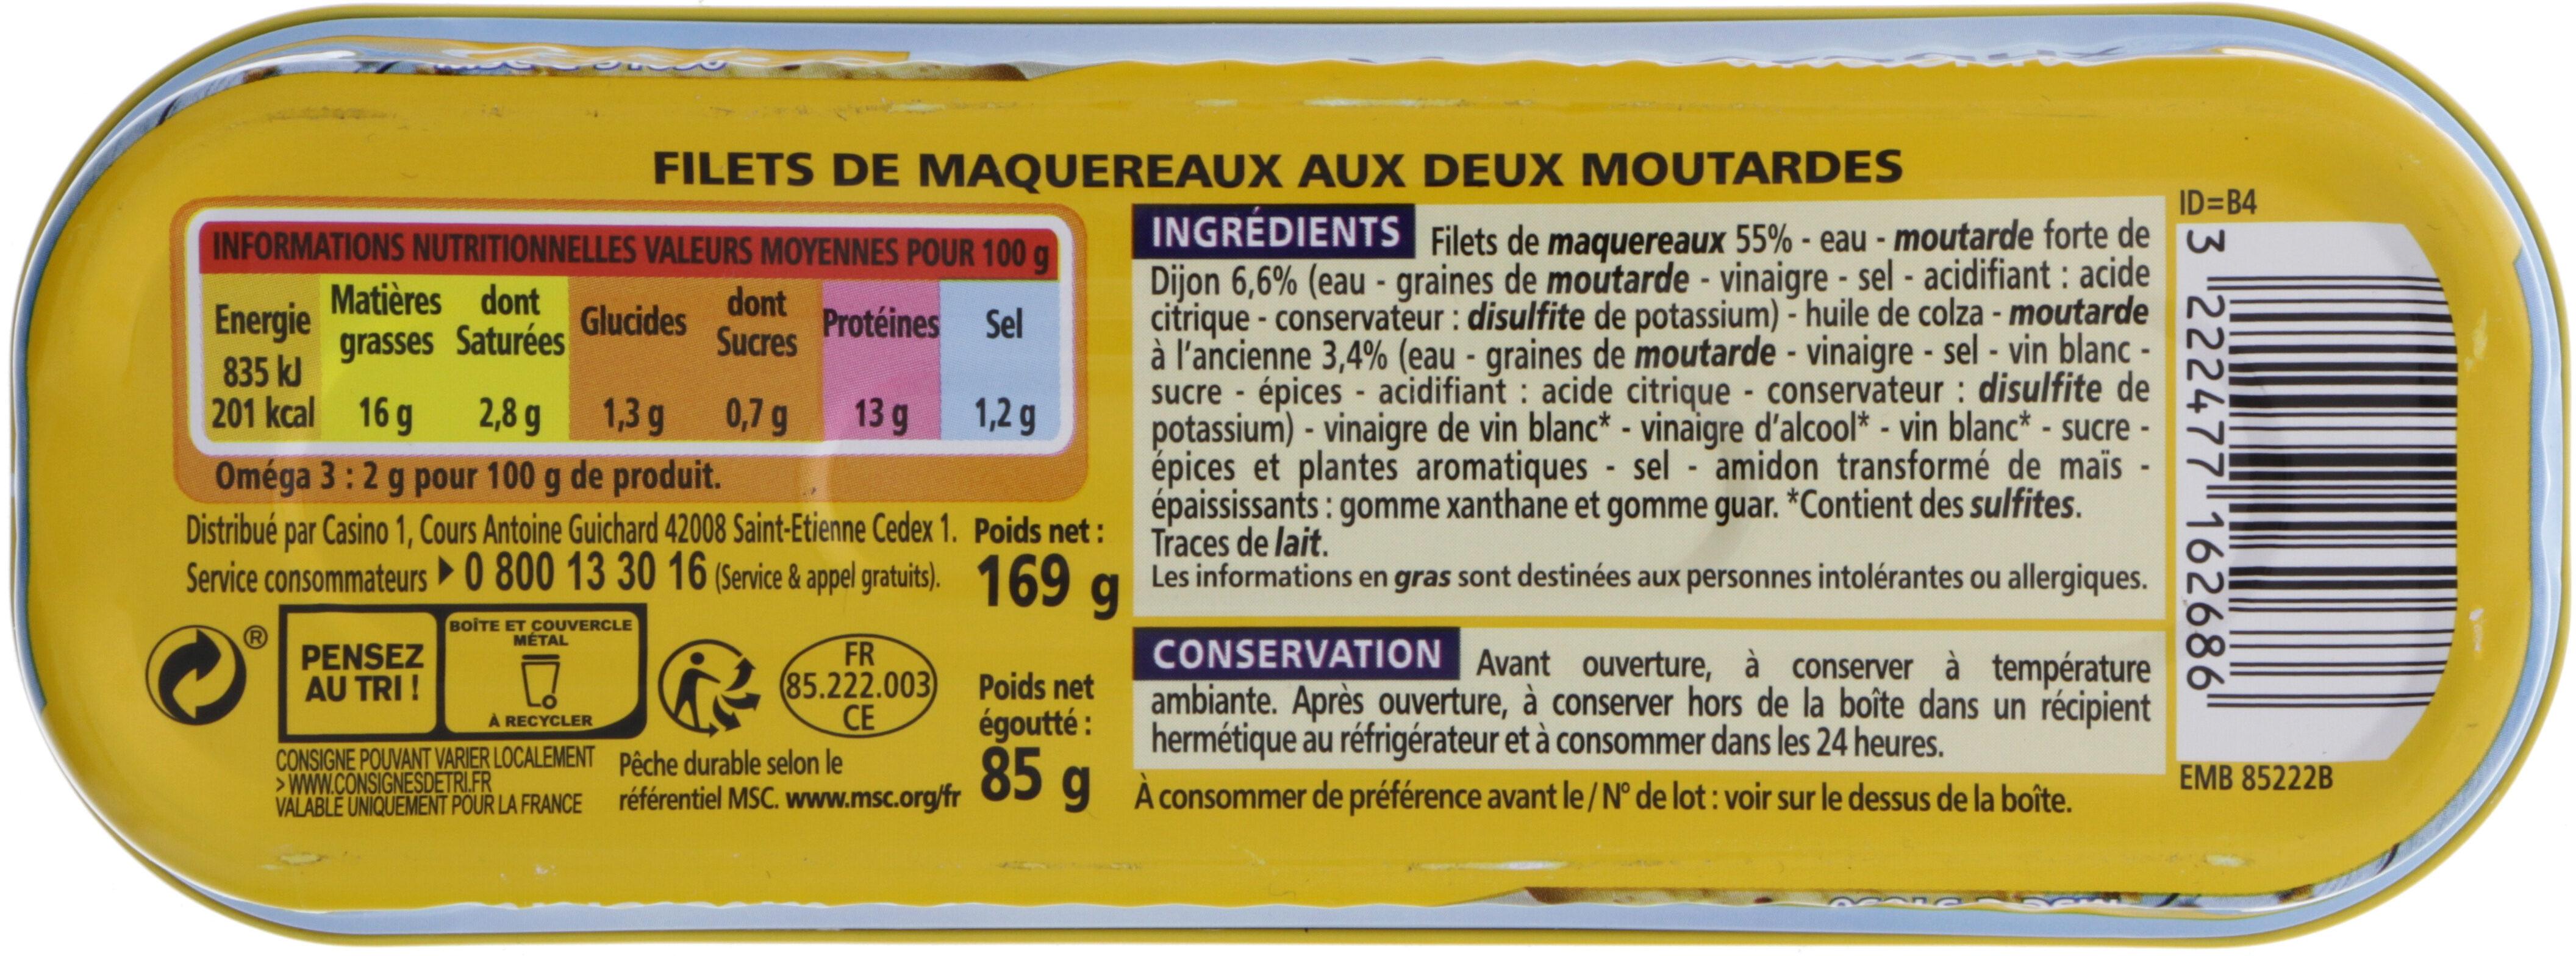 Filets de maquereaux - Voedingswaarden - fr